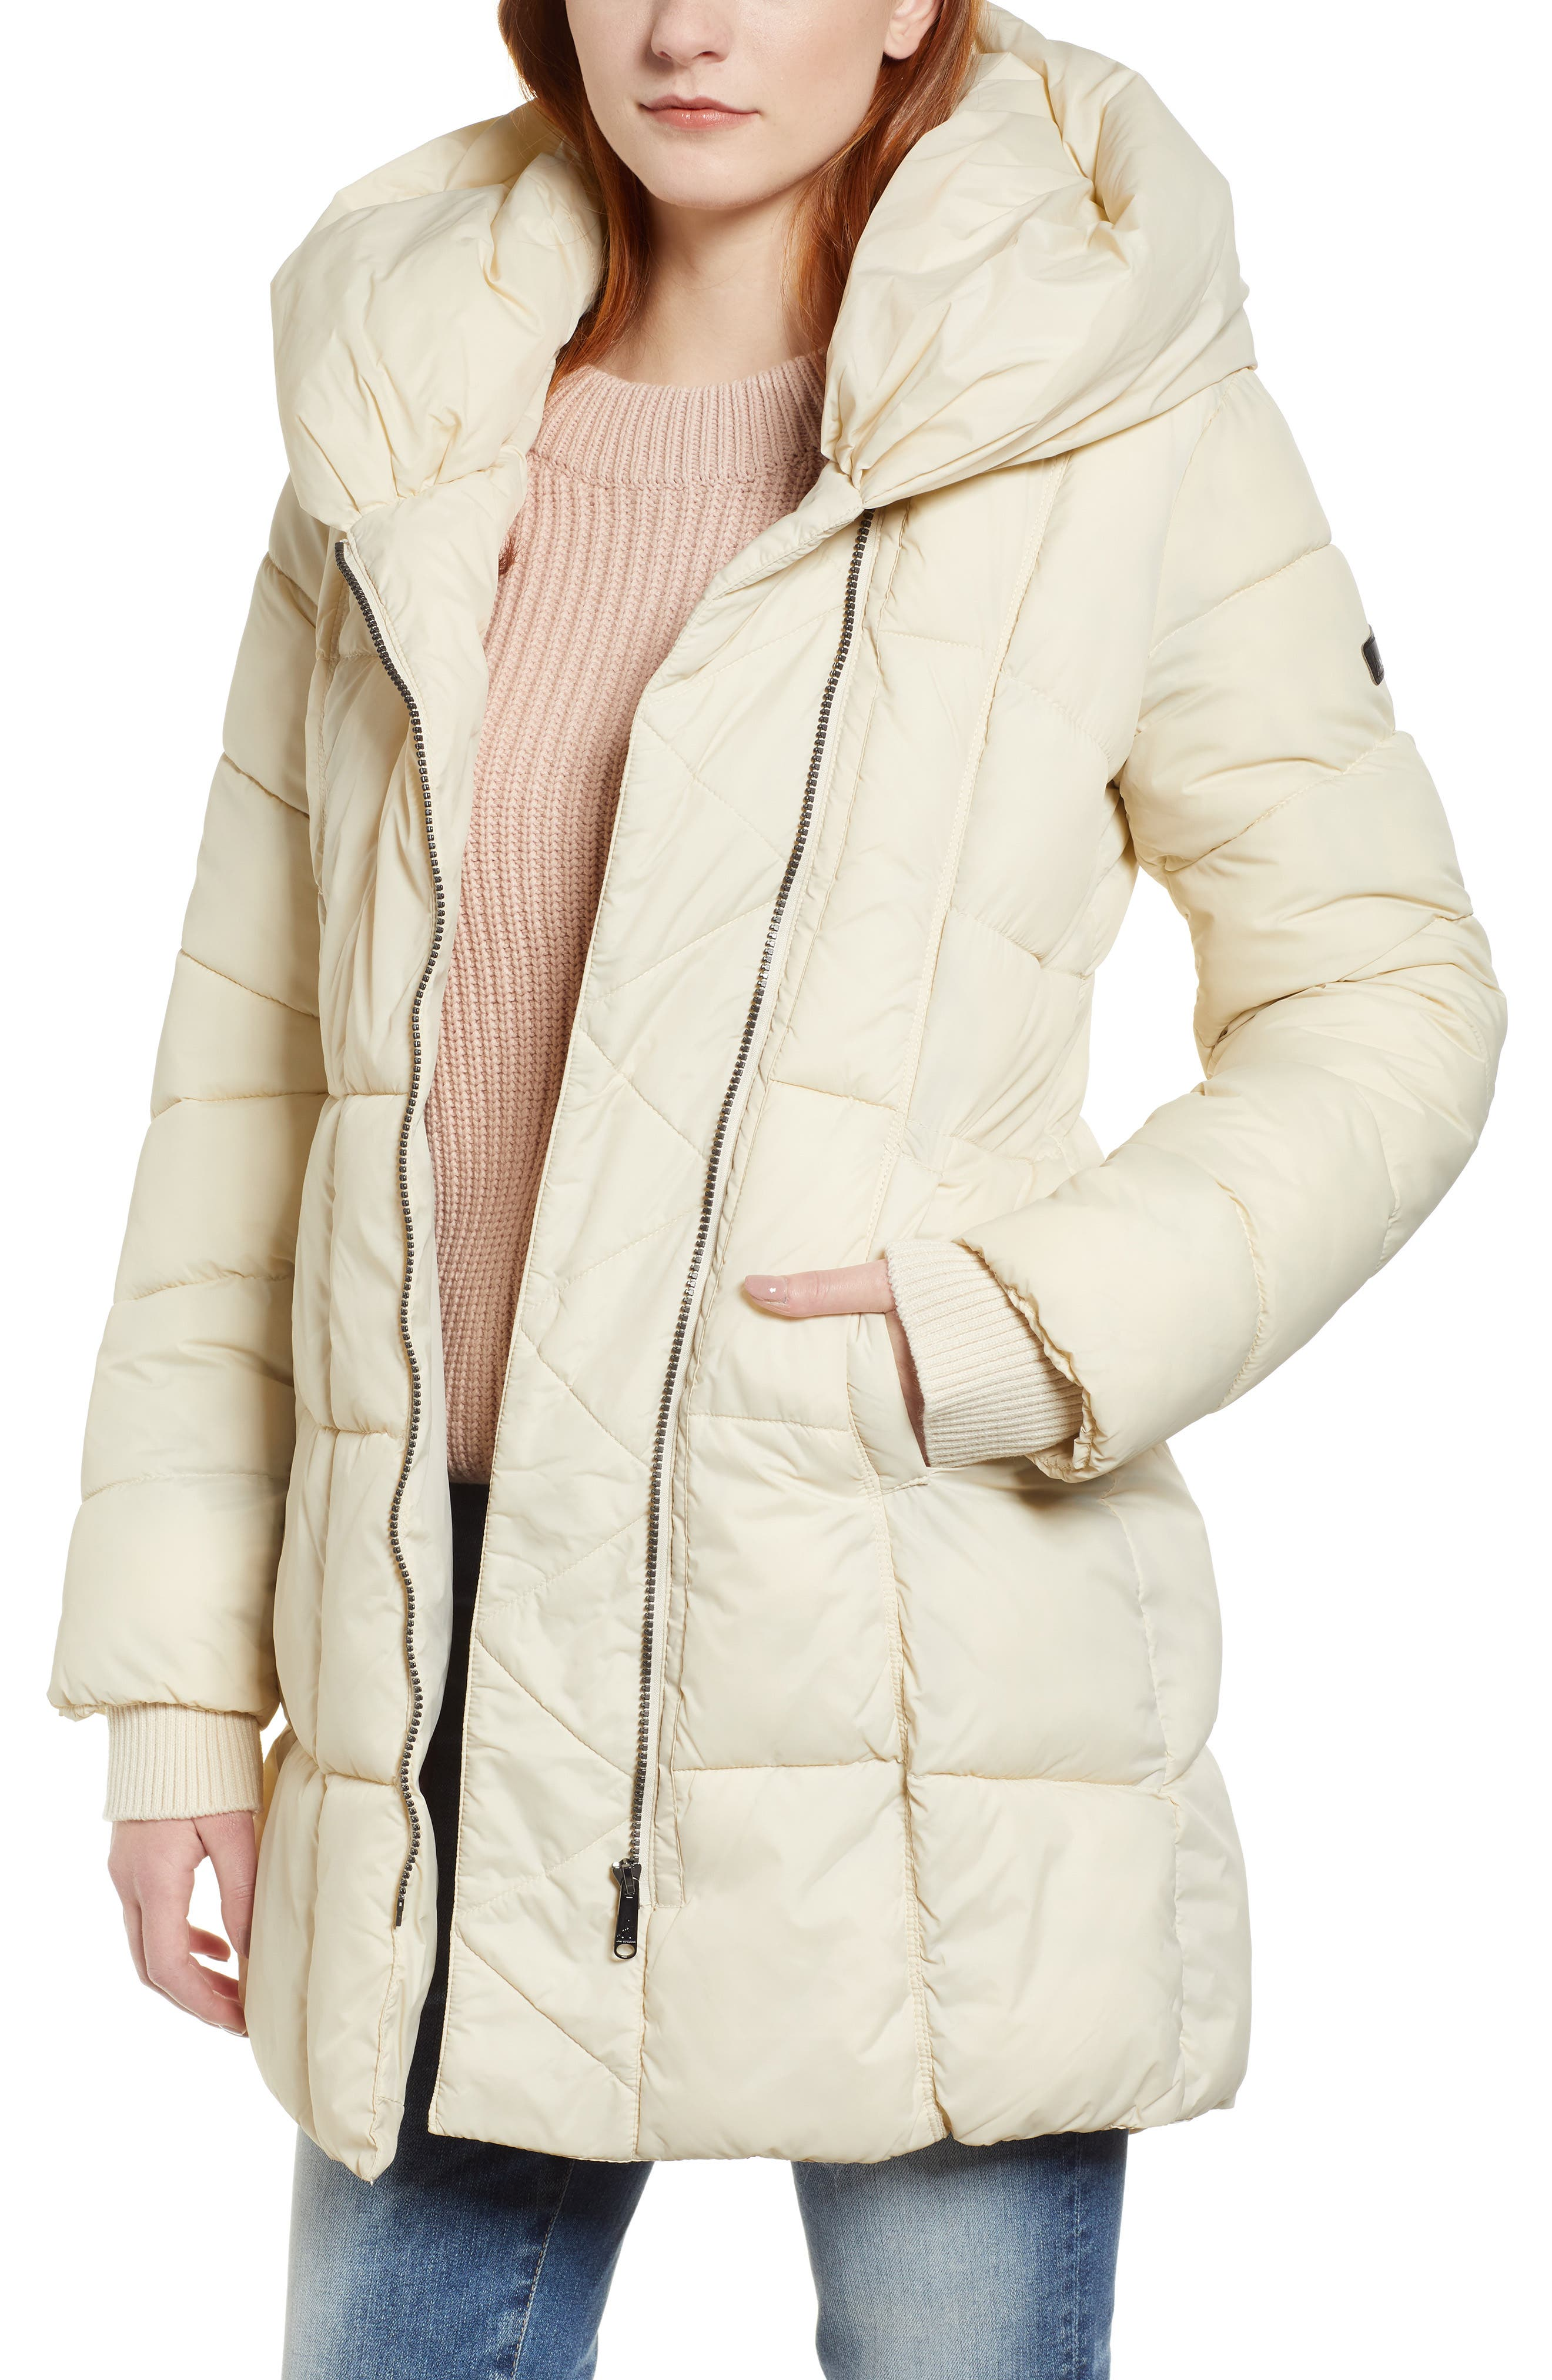 Pillow Collar Puffer Coat,                         Main,                         color, IVORY